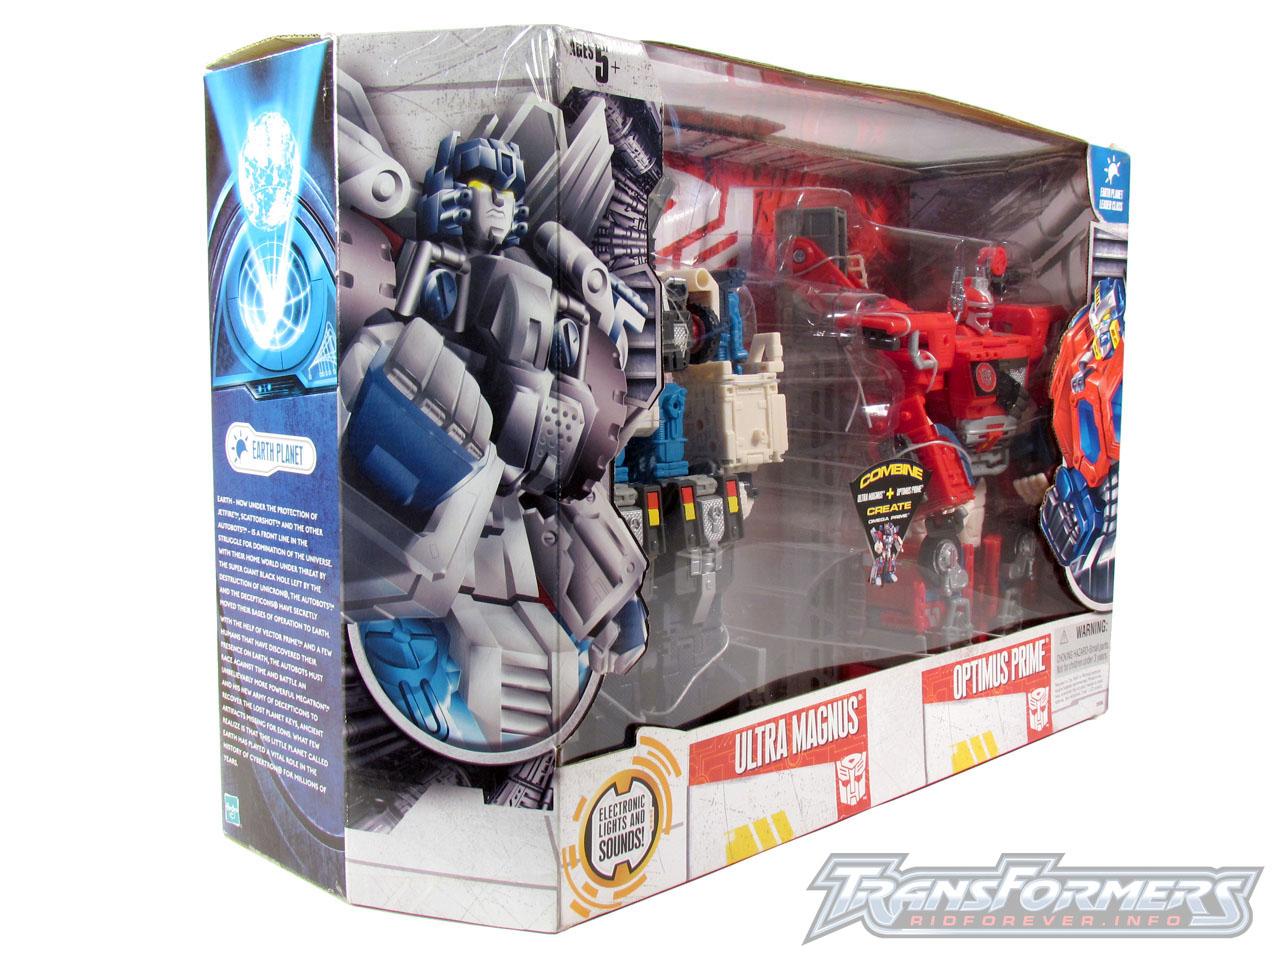 Cybertron Omega Prime 002